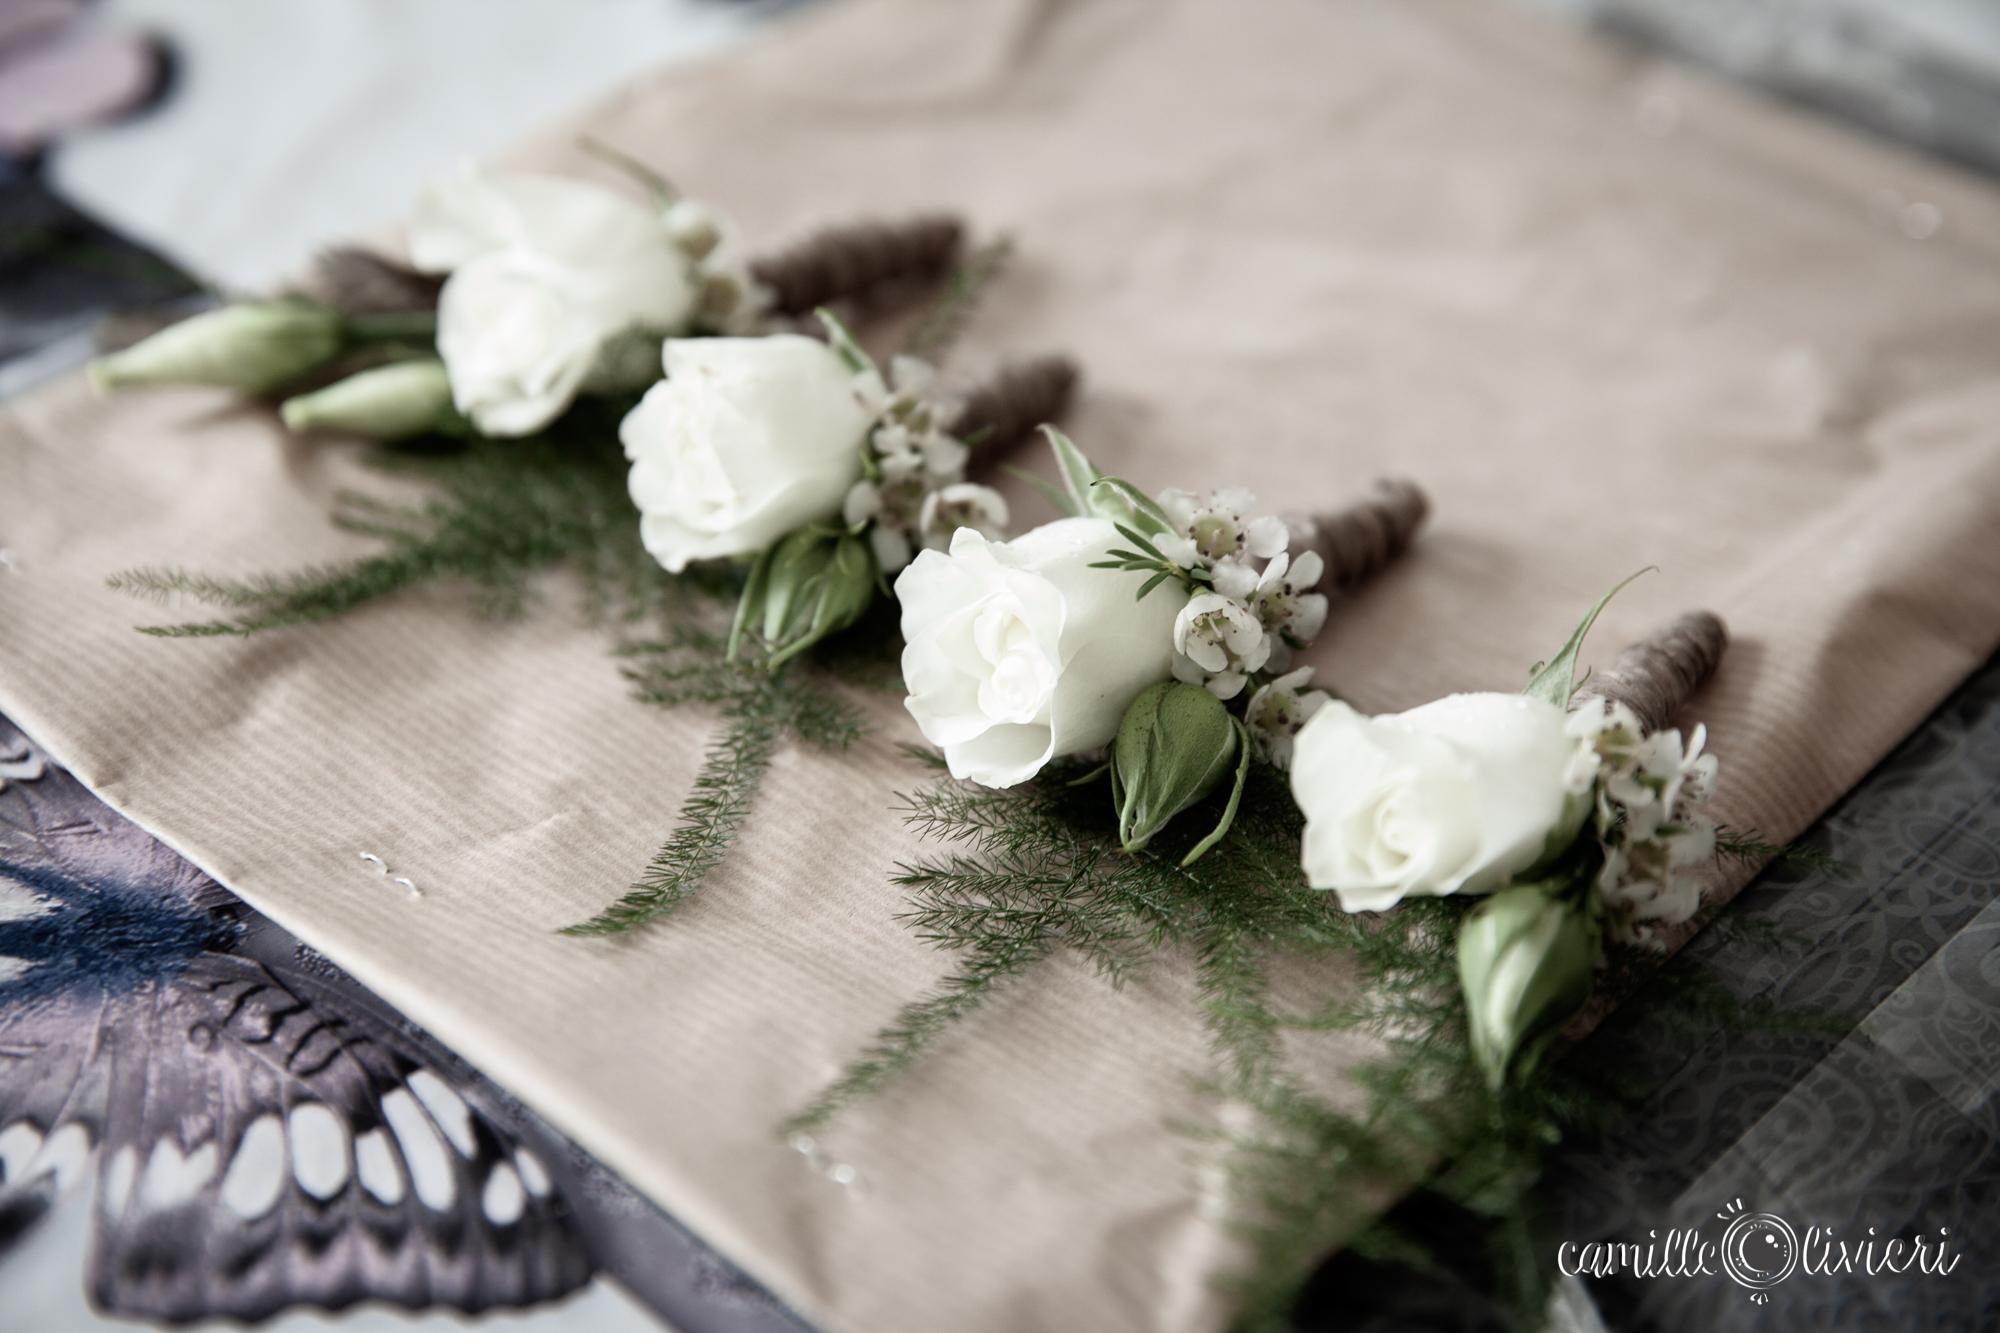 photographe_grenoble_mariage-camille-olivieri-99